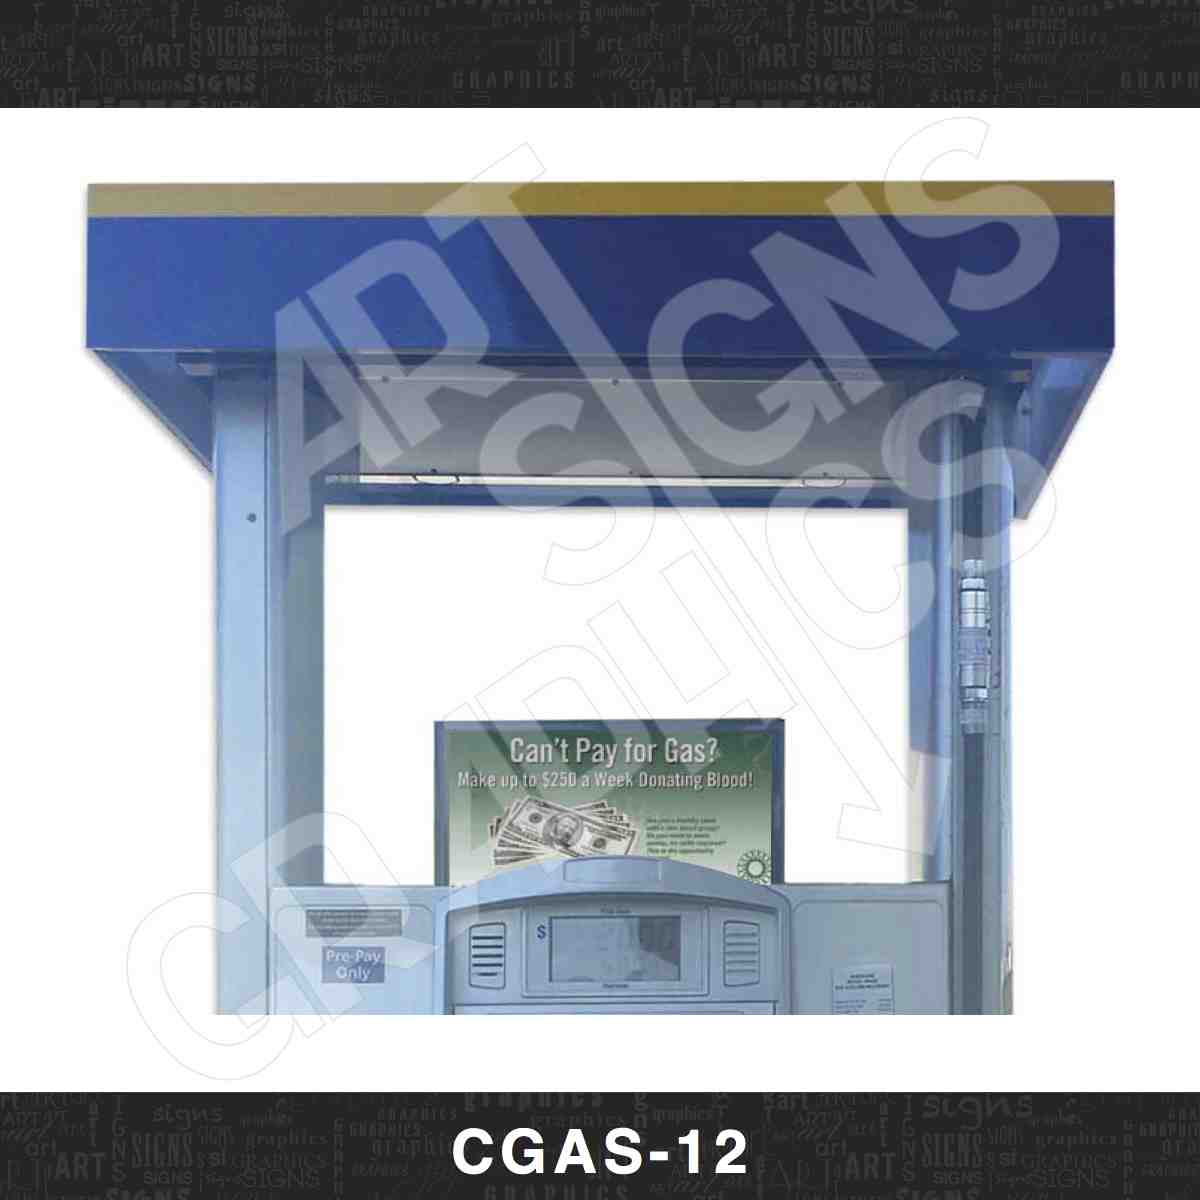 CGAS_12.jpg